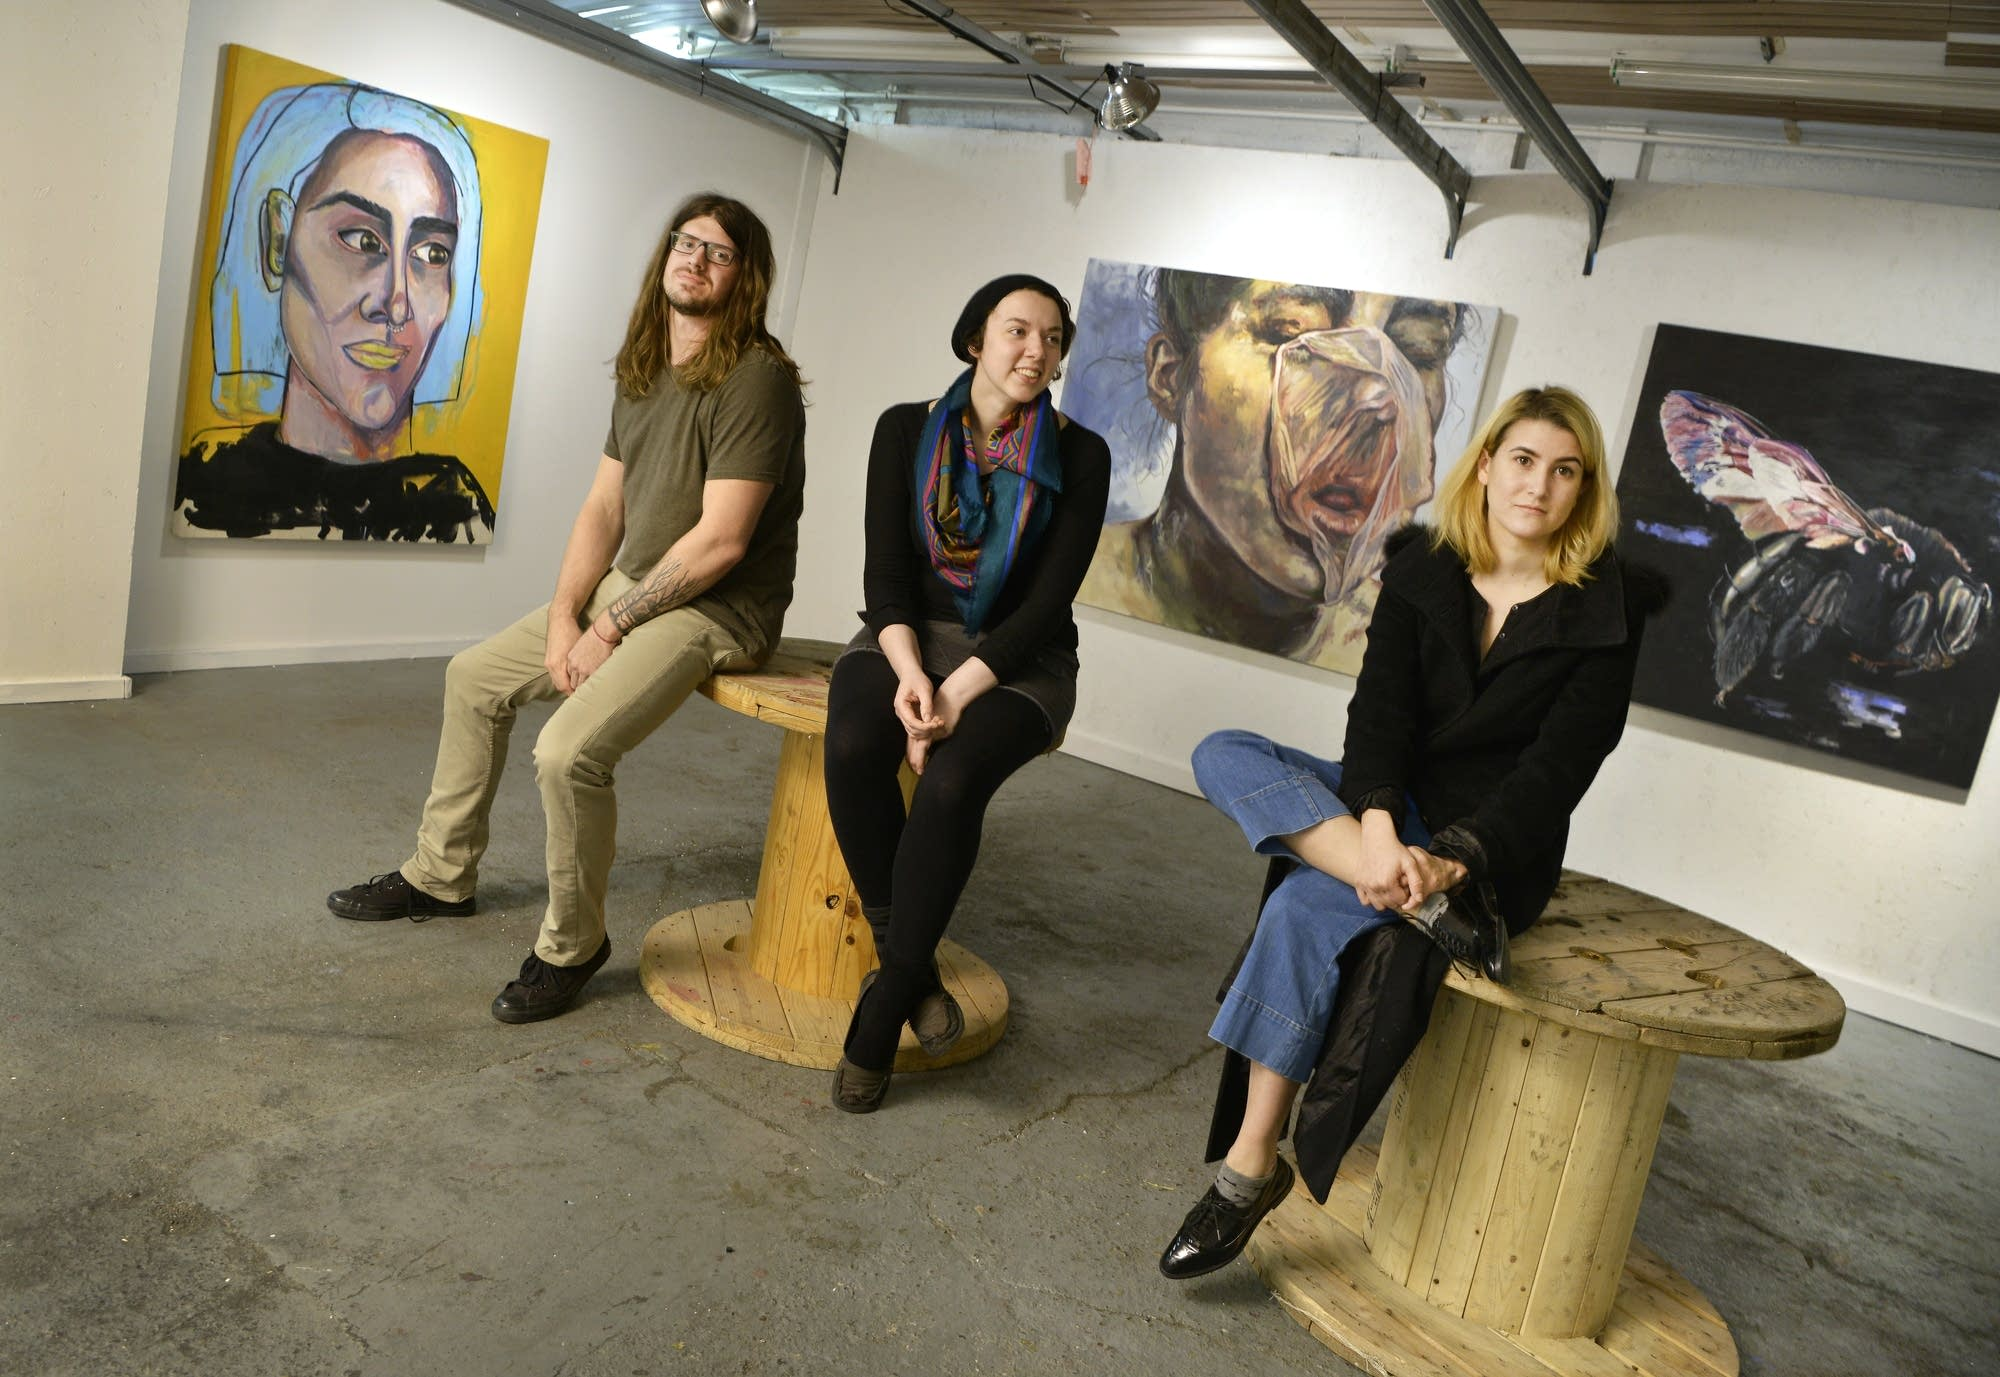 Tyler Gefroh, Beata Weber, Andrea Qual